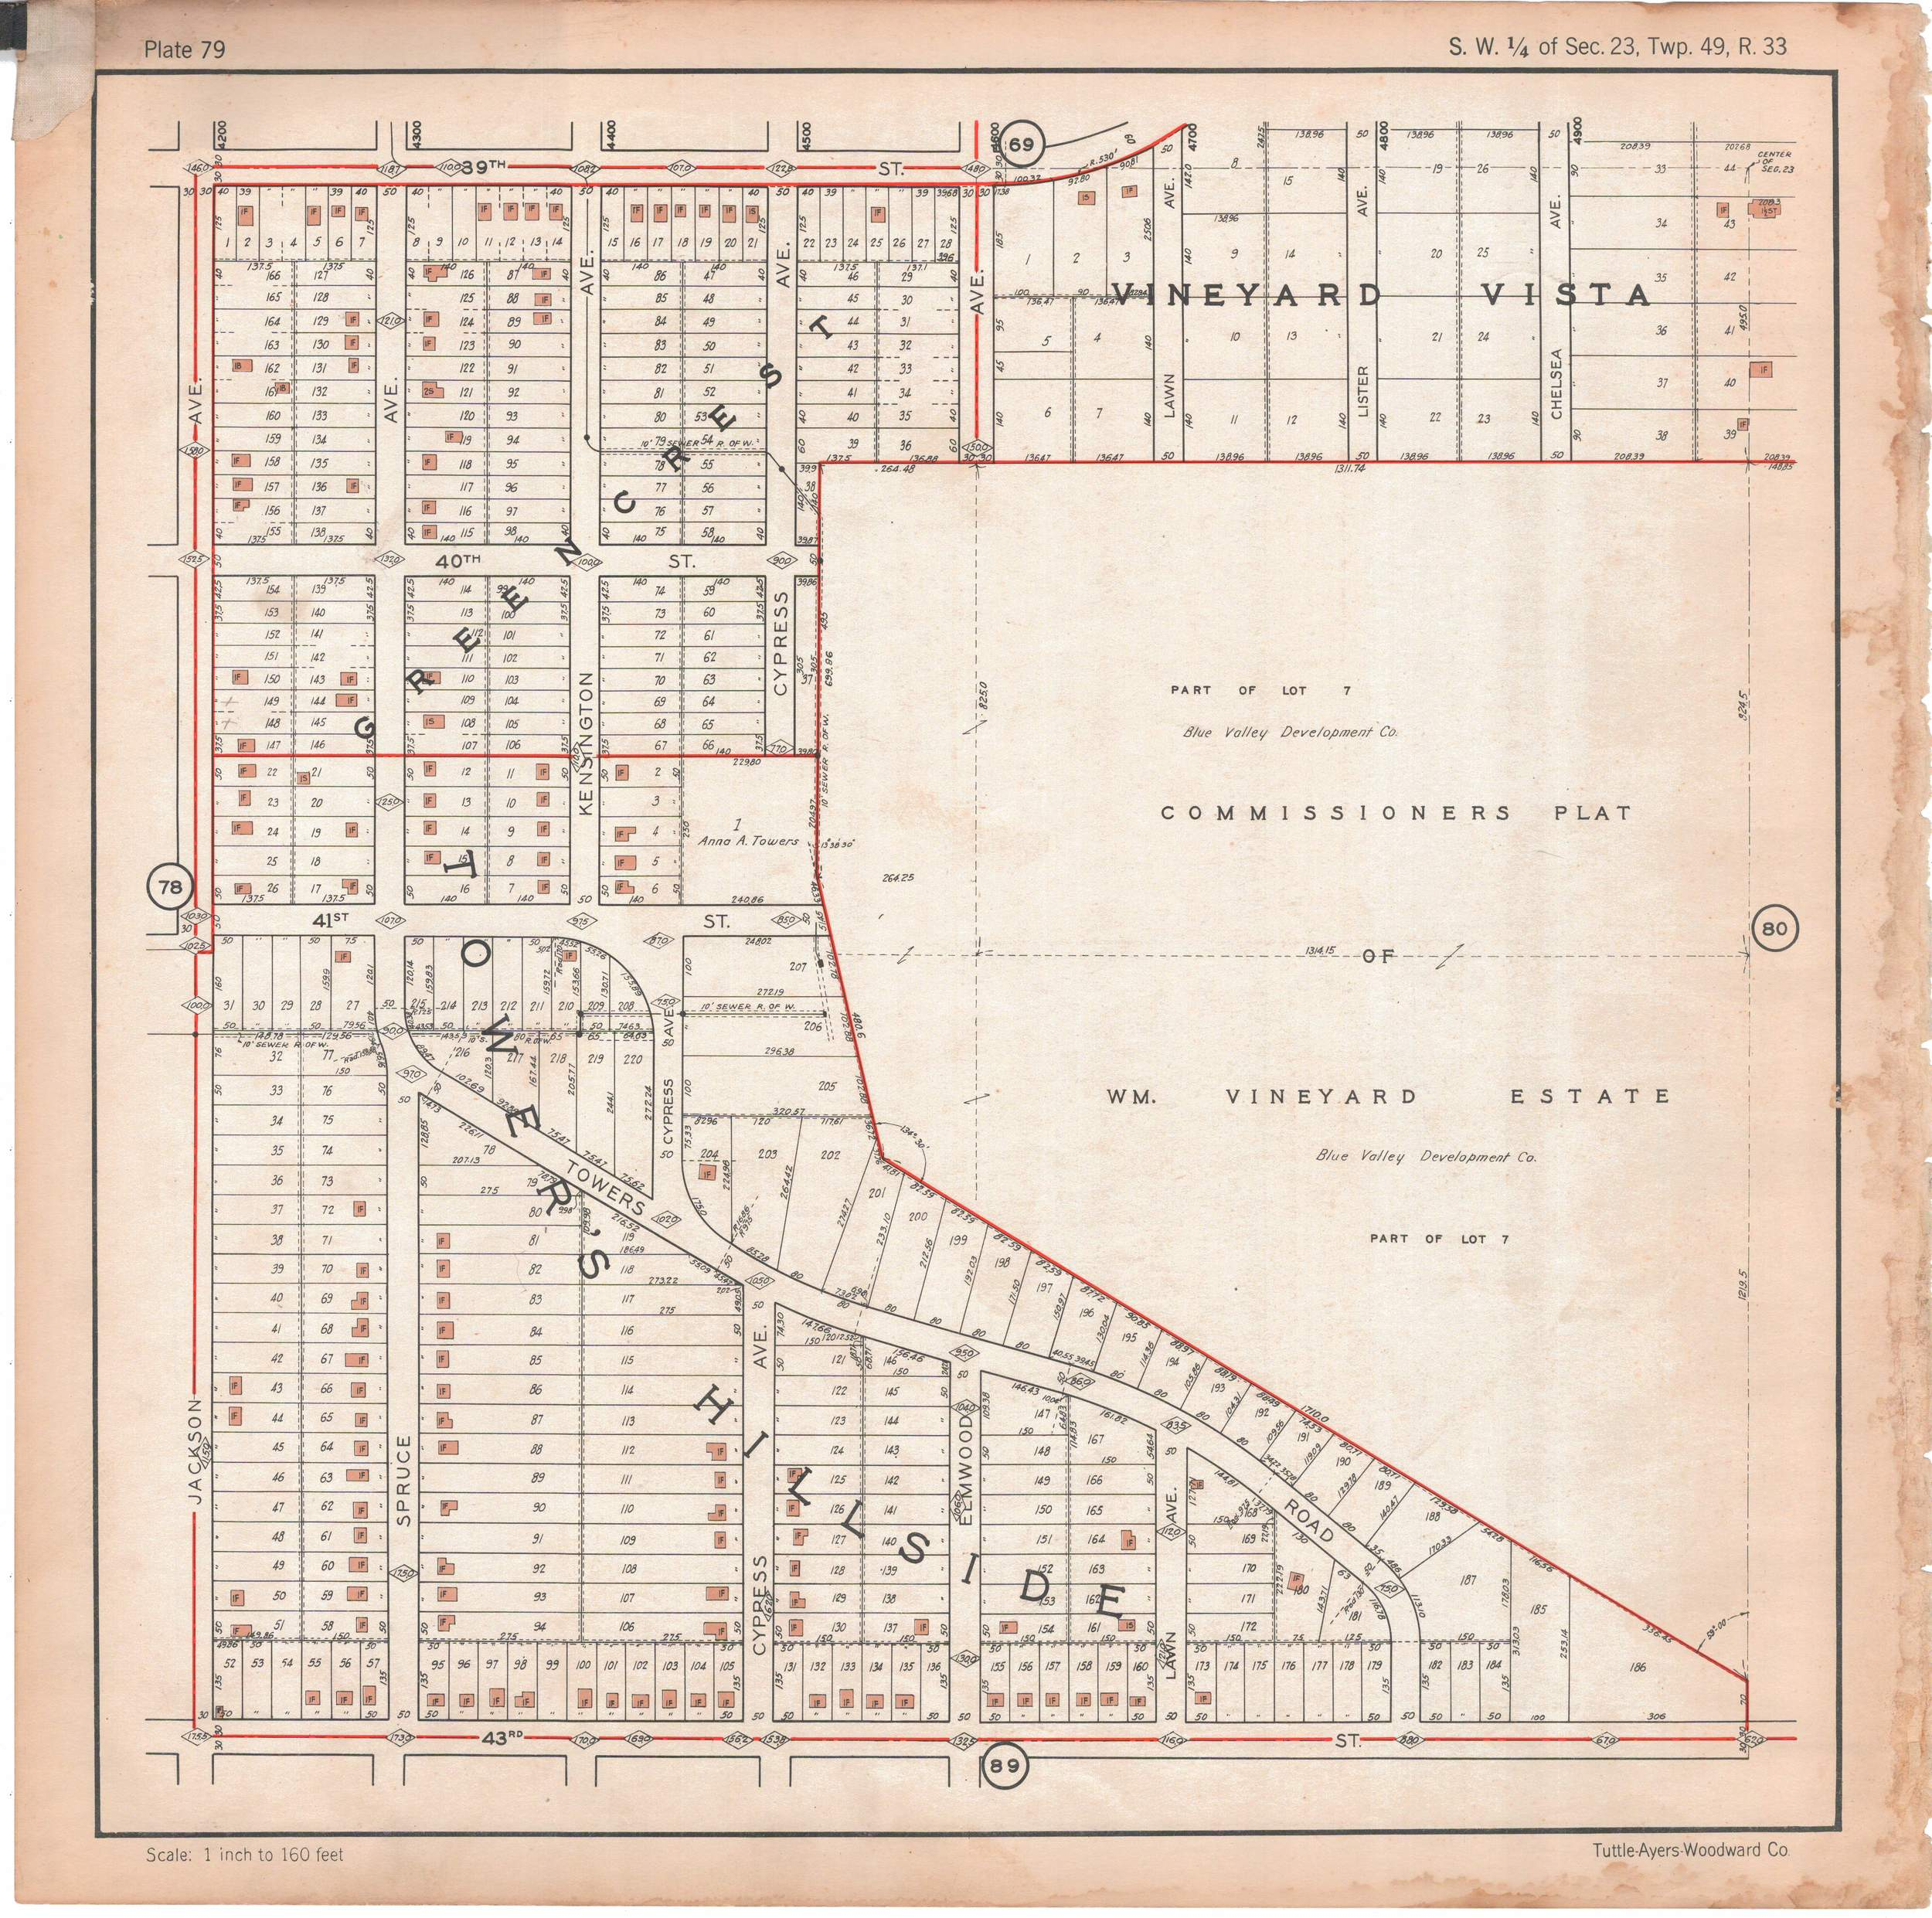 1925 TUTTLE_AYERS_Plate 79.JPG